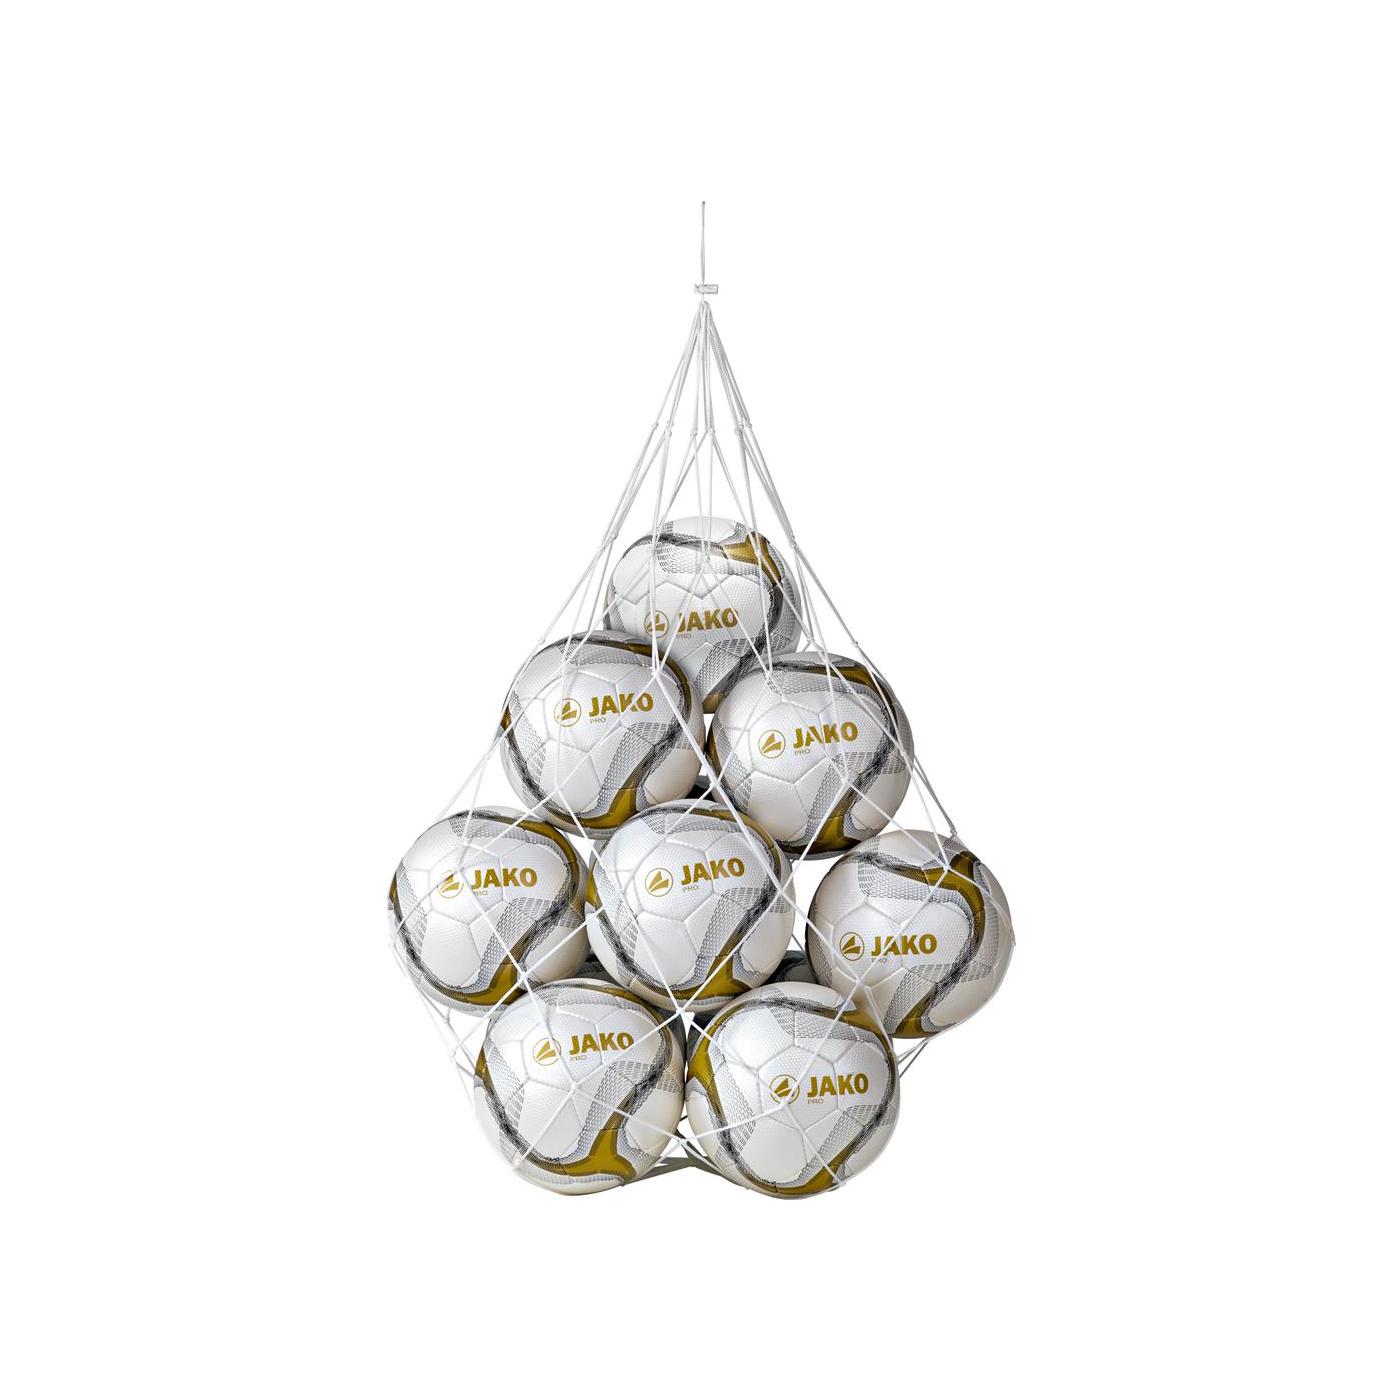 Jako Ballnetz für 10 Bälle 2390